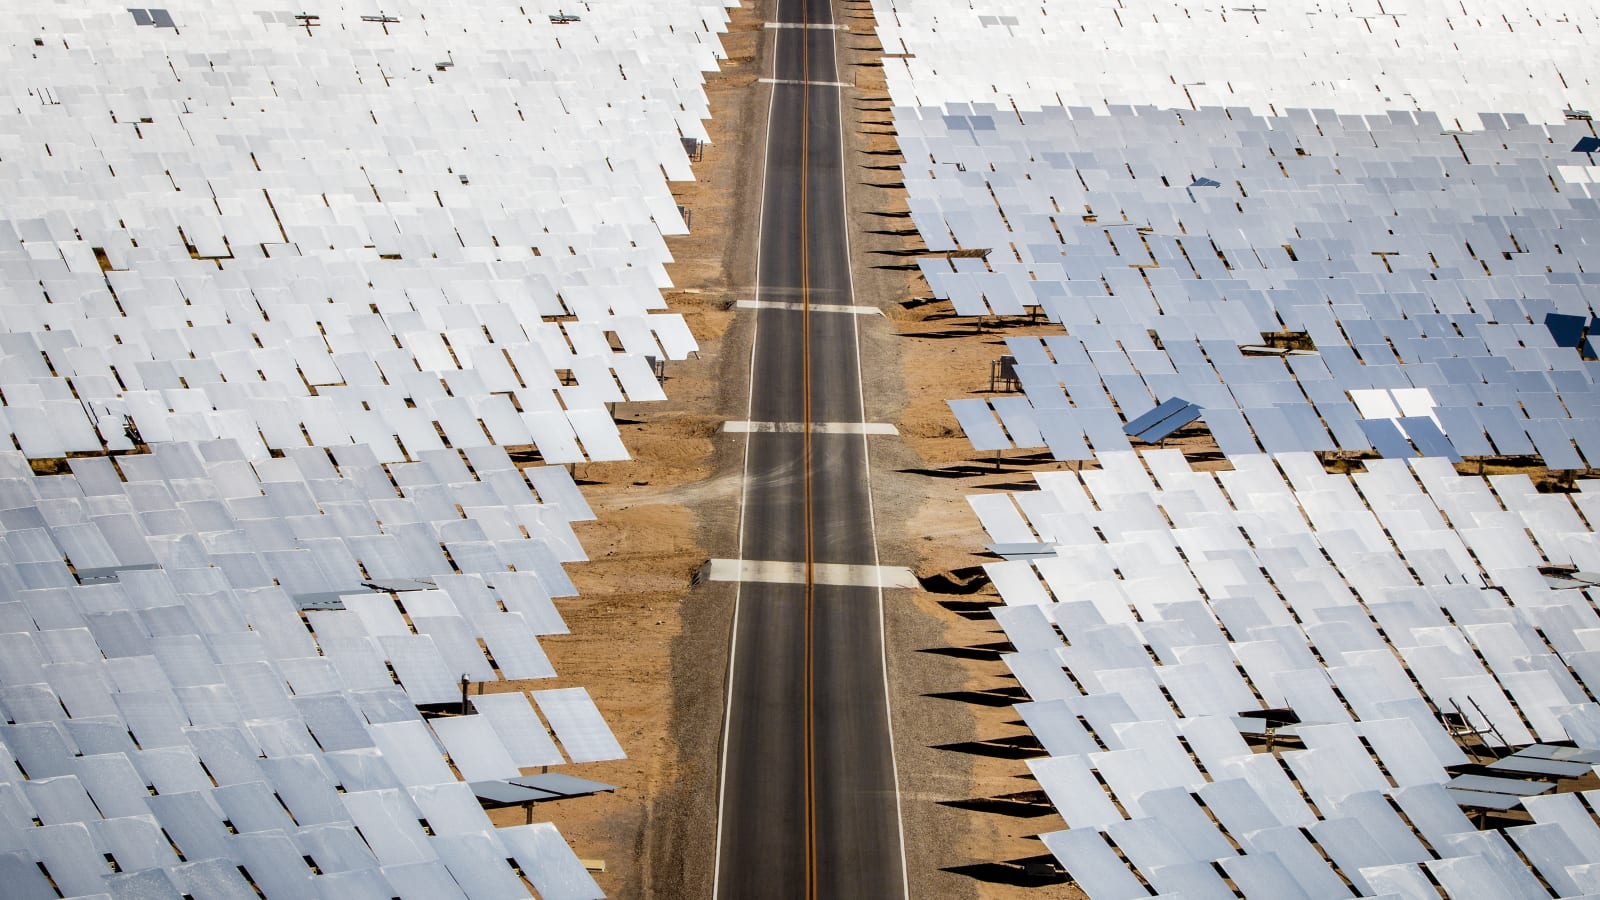 USA - Energy - Ivanpah